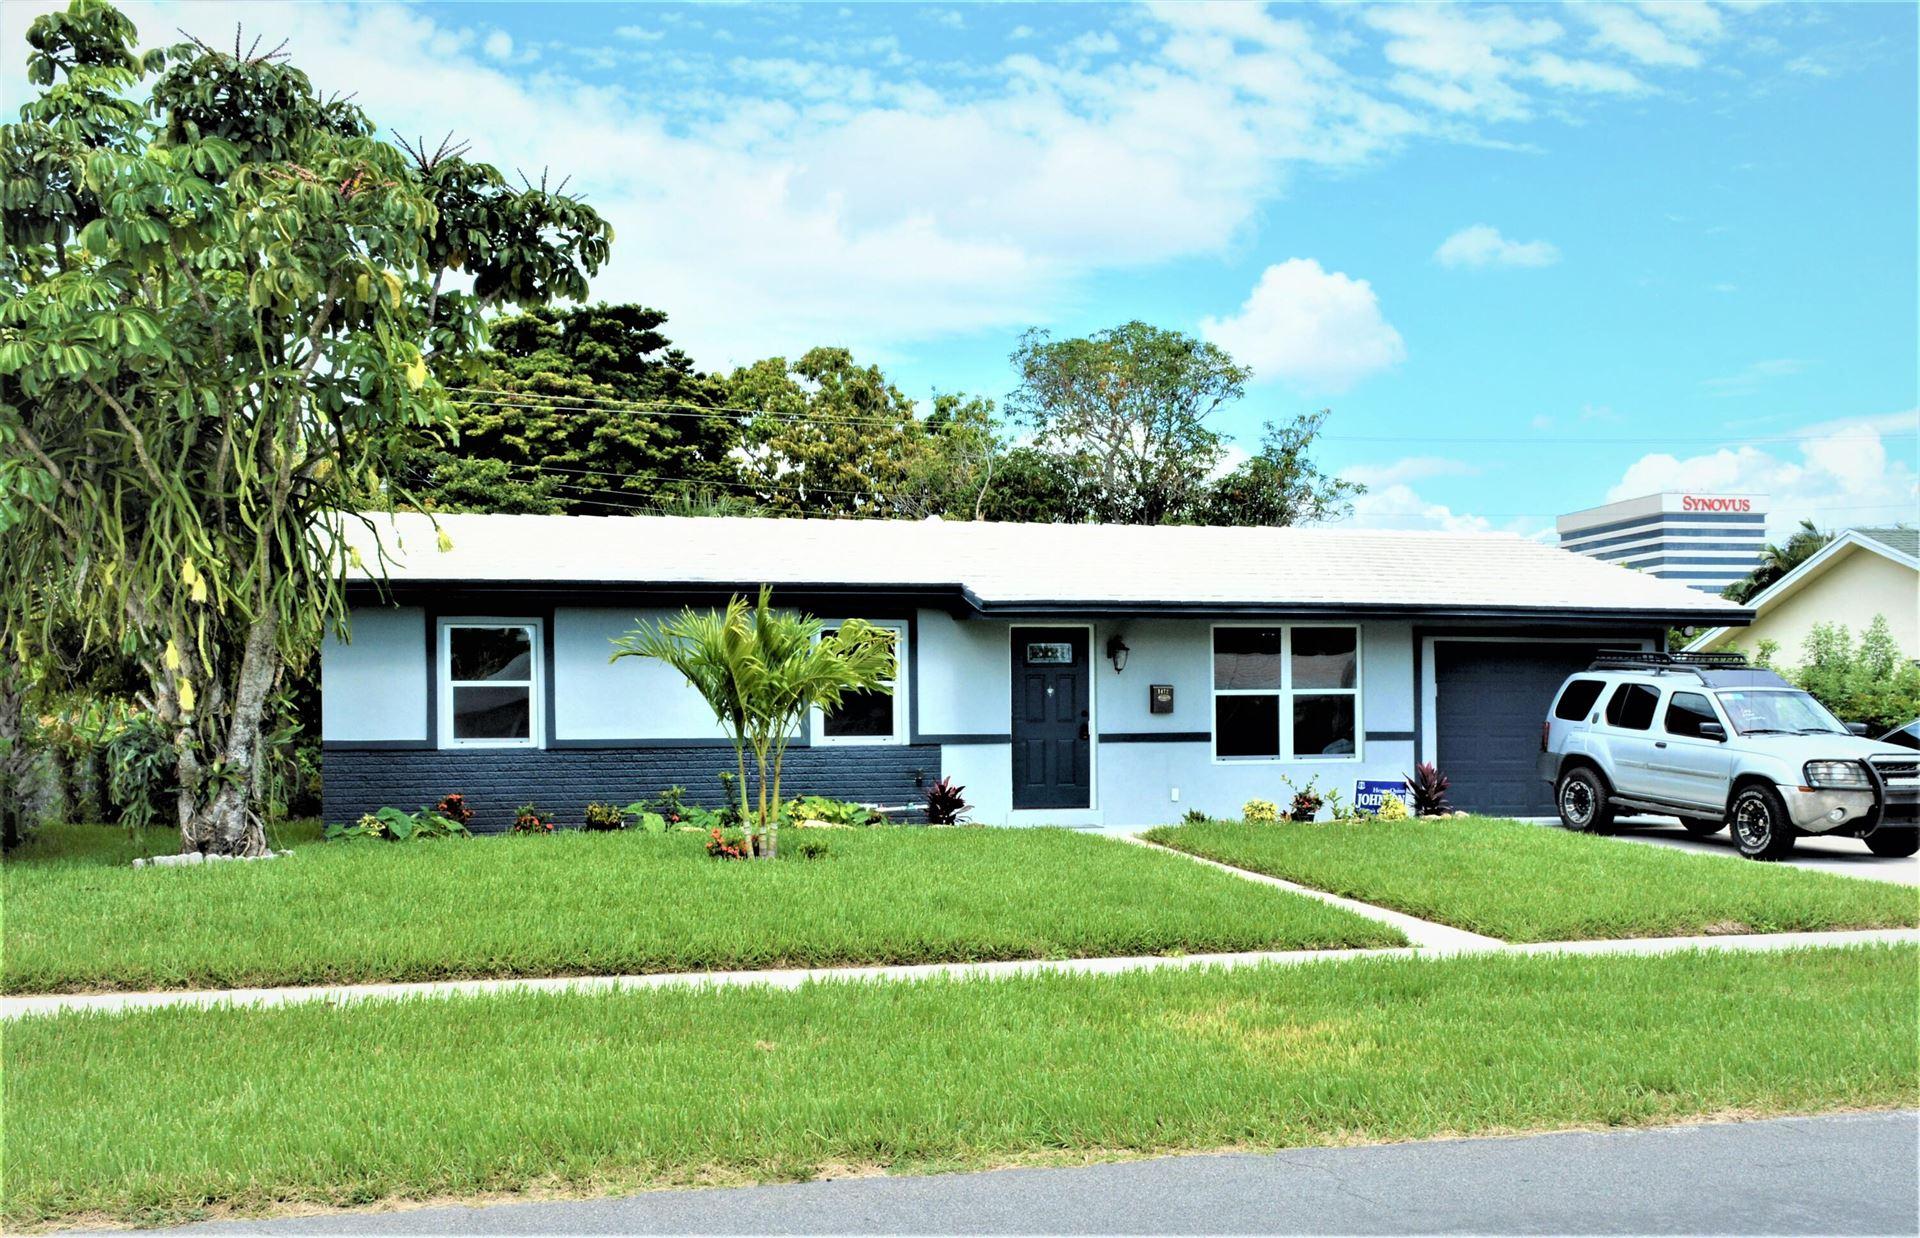 1472 7th Street, West Palm Beach, FL 33401 - MLS#: RX-10729263